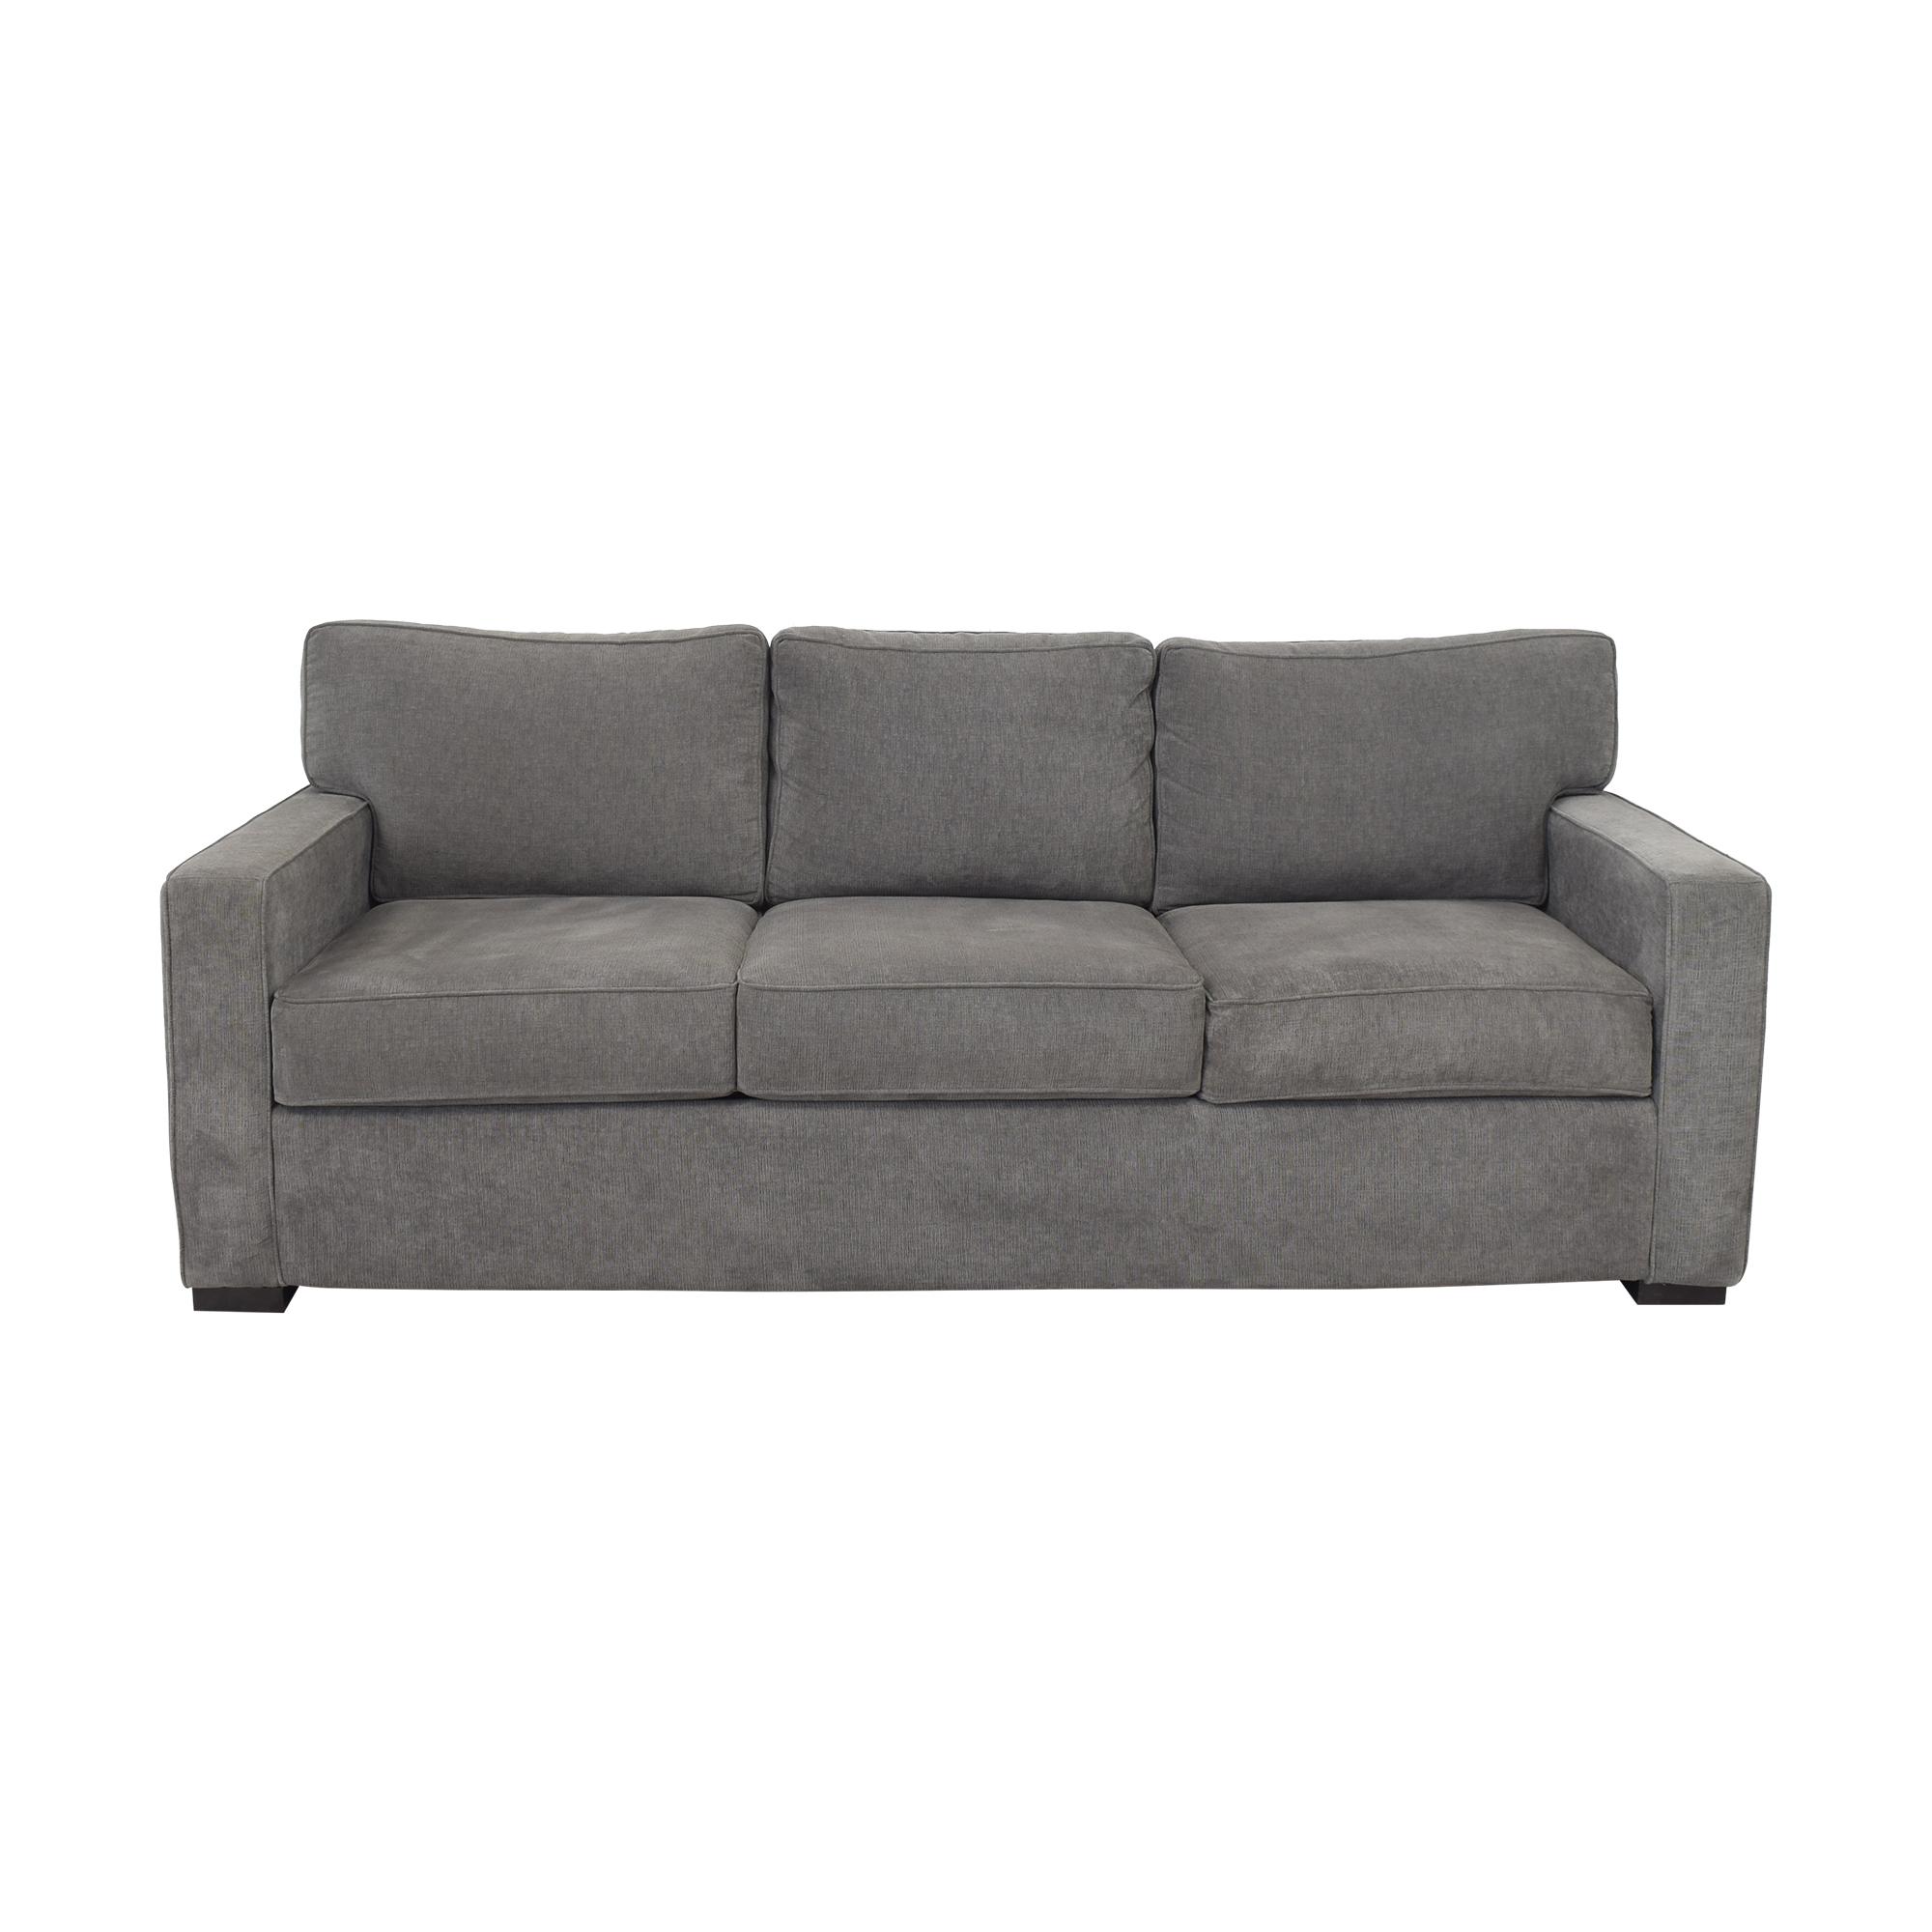 Macy's Macy's Radley Fabric Sofa Sofas